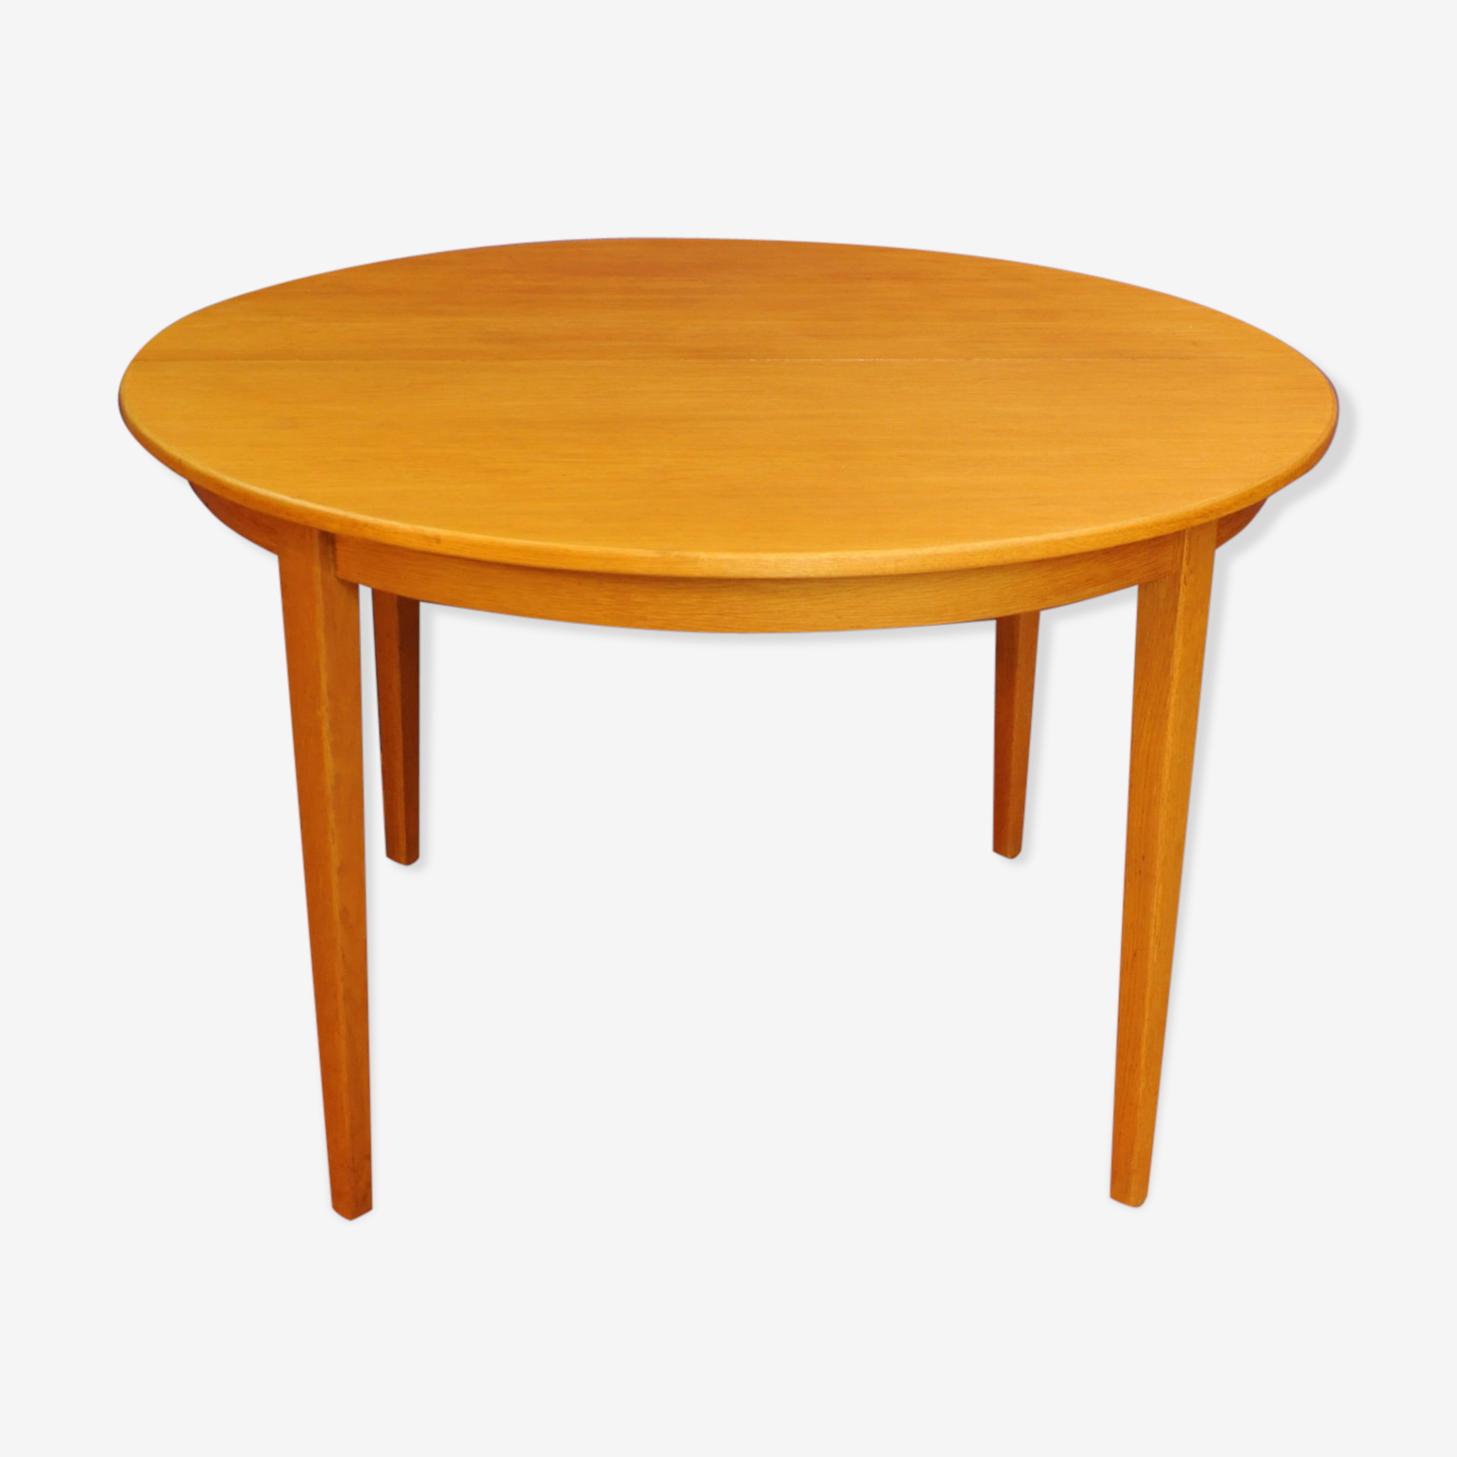 Retro dining table Lata 60-70 teak